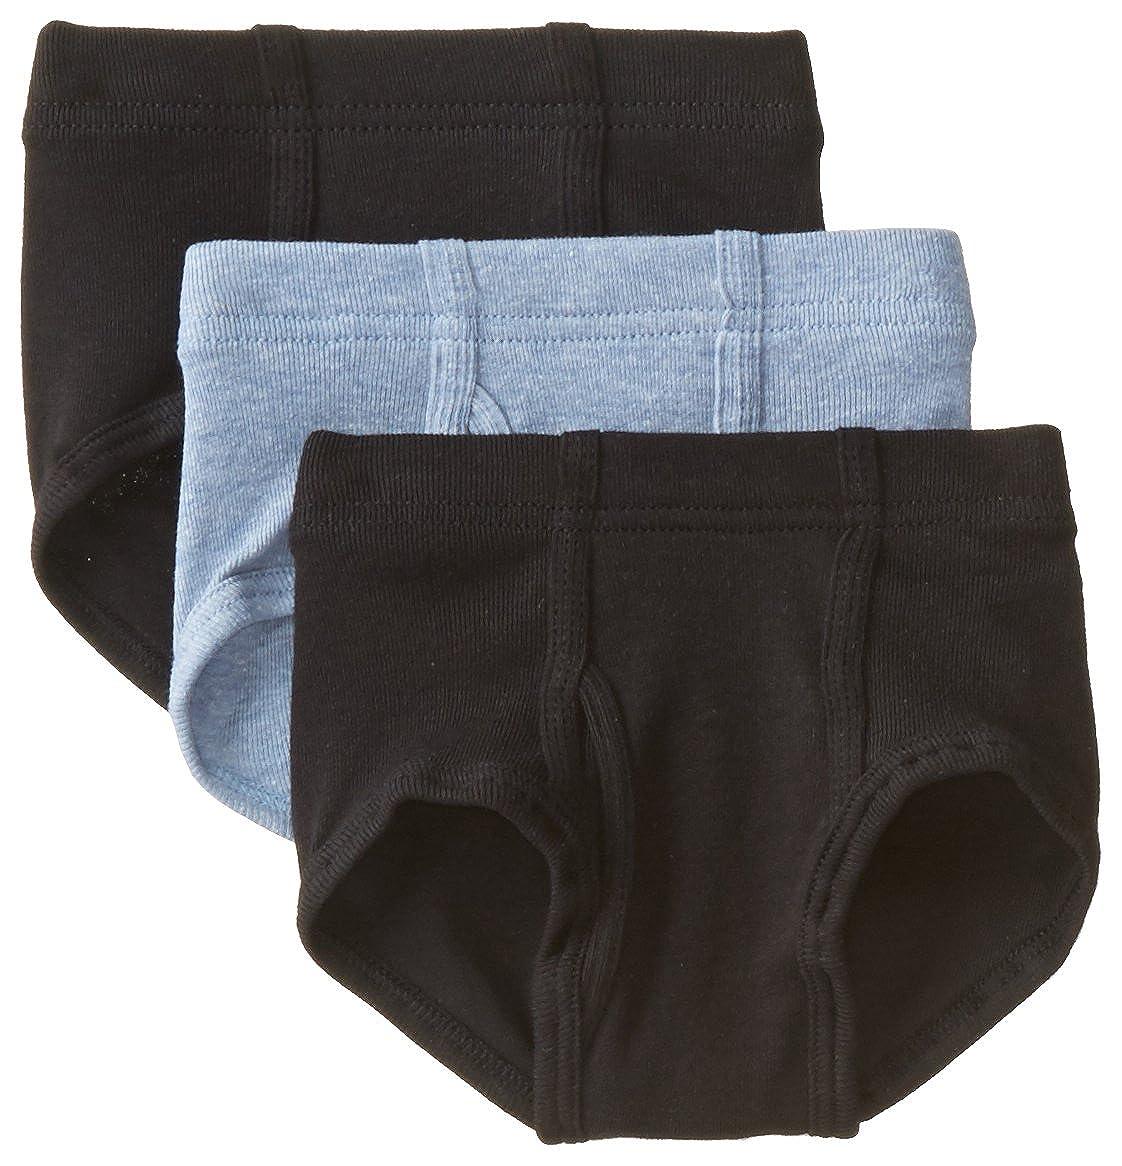 Hanes boys Big Boys 3 Pack Ultimate Comfortsoft Dyed Brief Hanes Boys 8-20 Underwear BU720A